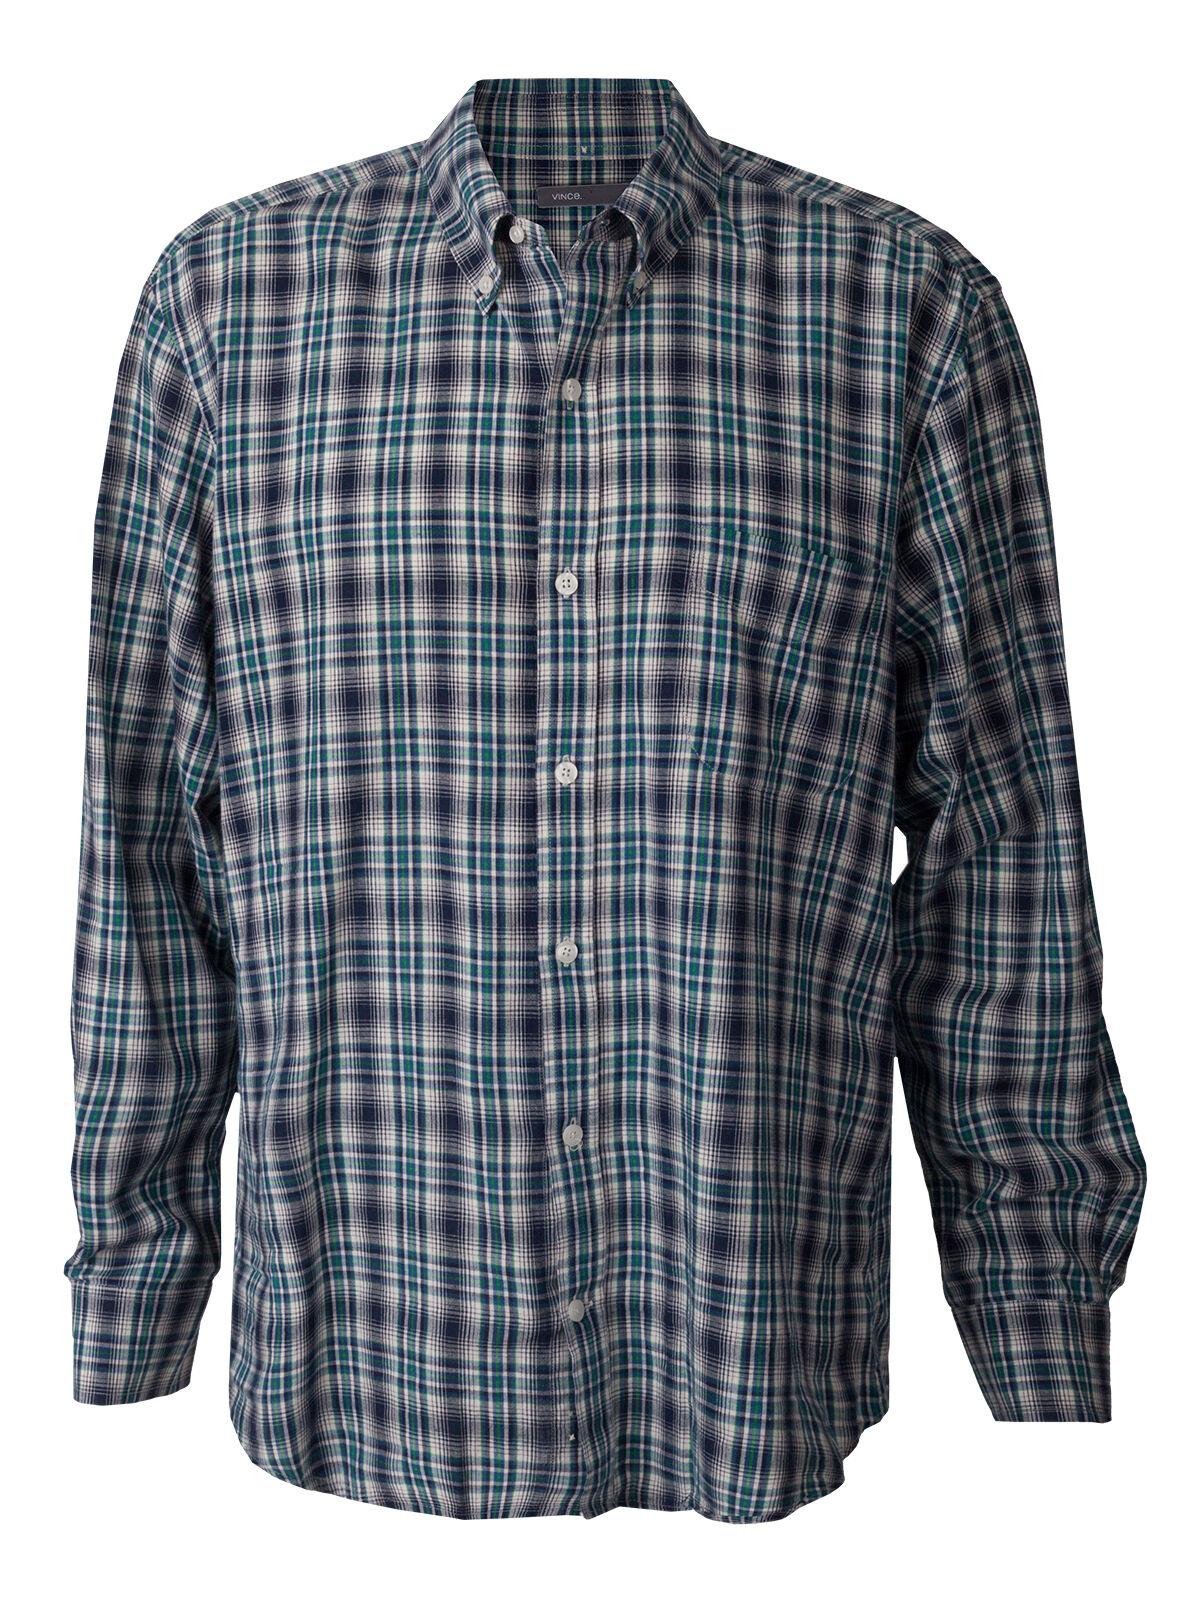 Men's Vince Plaid Button Shirt Multicolor Green bluee Nordstrom Designer Vtg XL